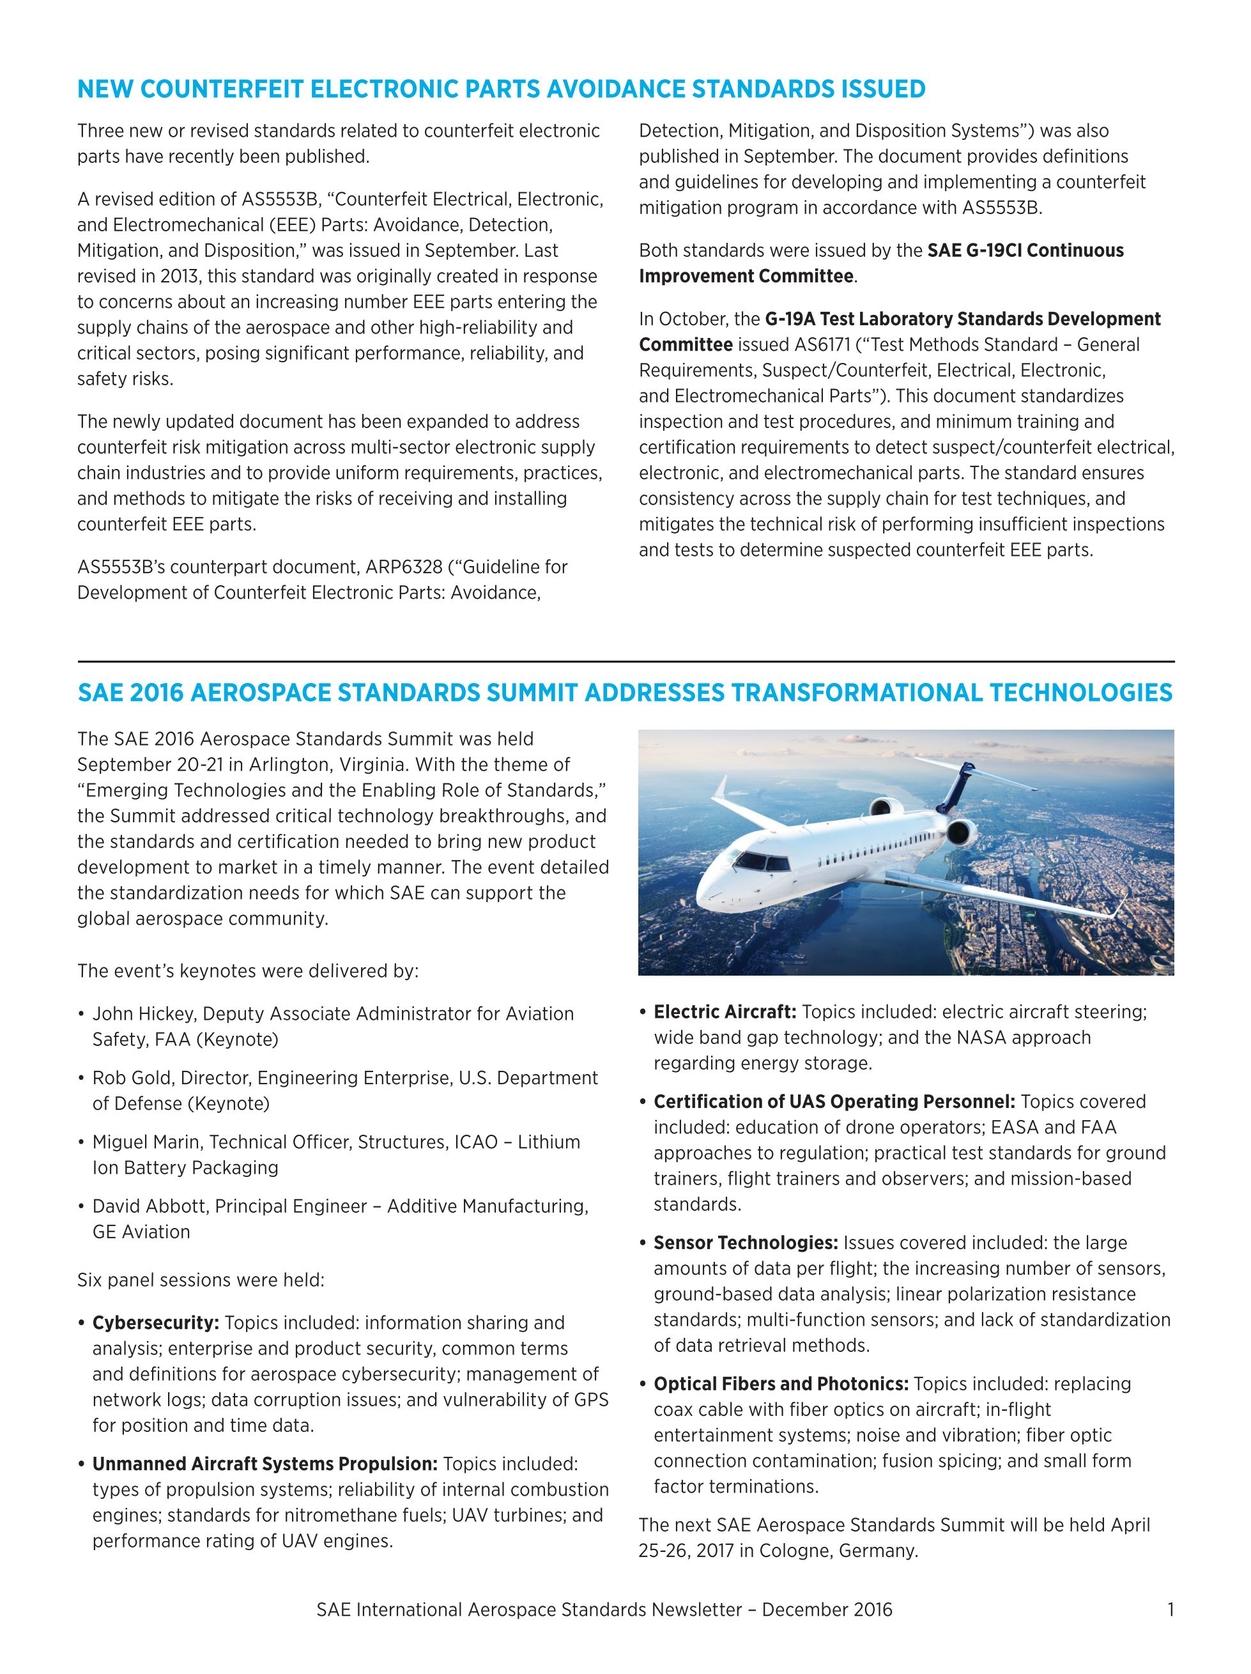 Aerospace Standards Newsletter - December 2016